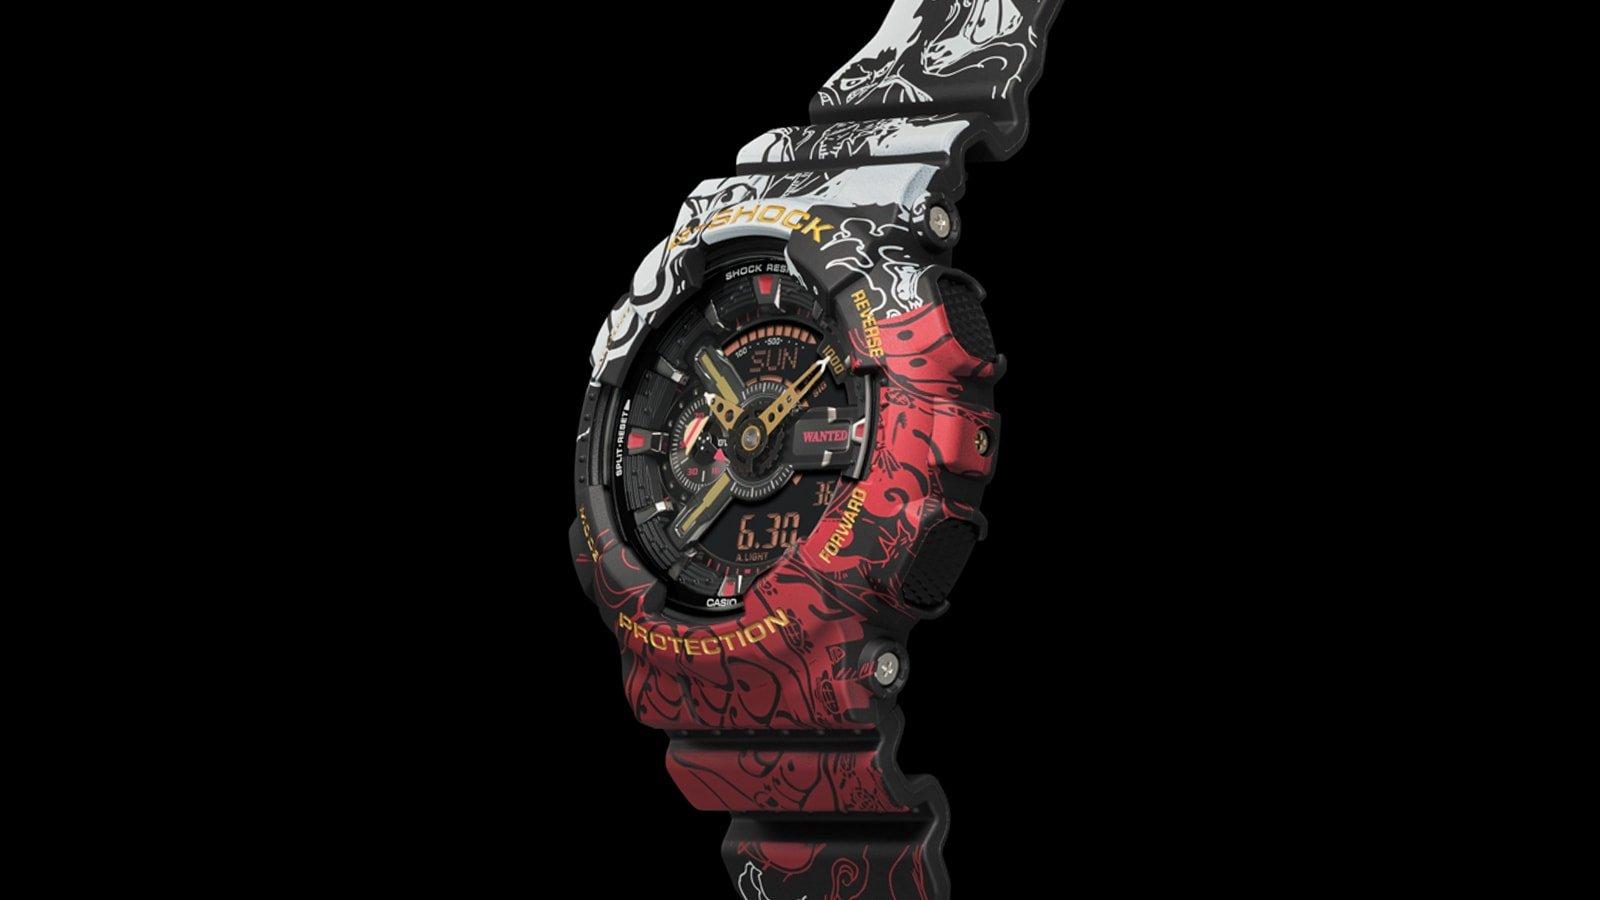 Casio One Piece G-Shock Watch Pays Homage To Luffy & His ...